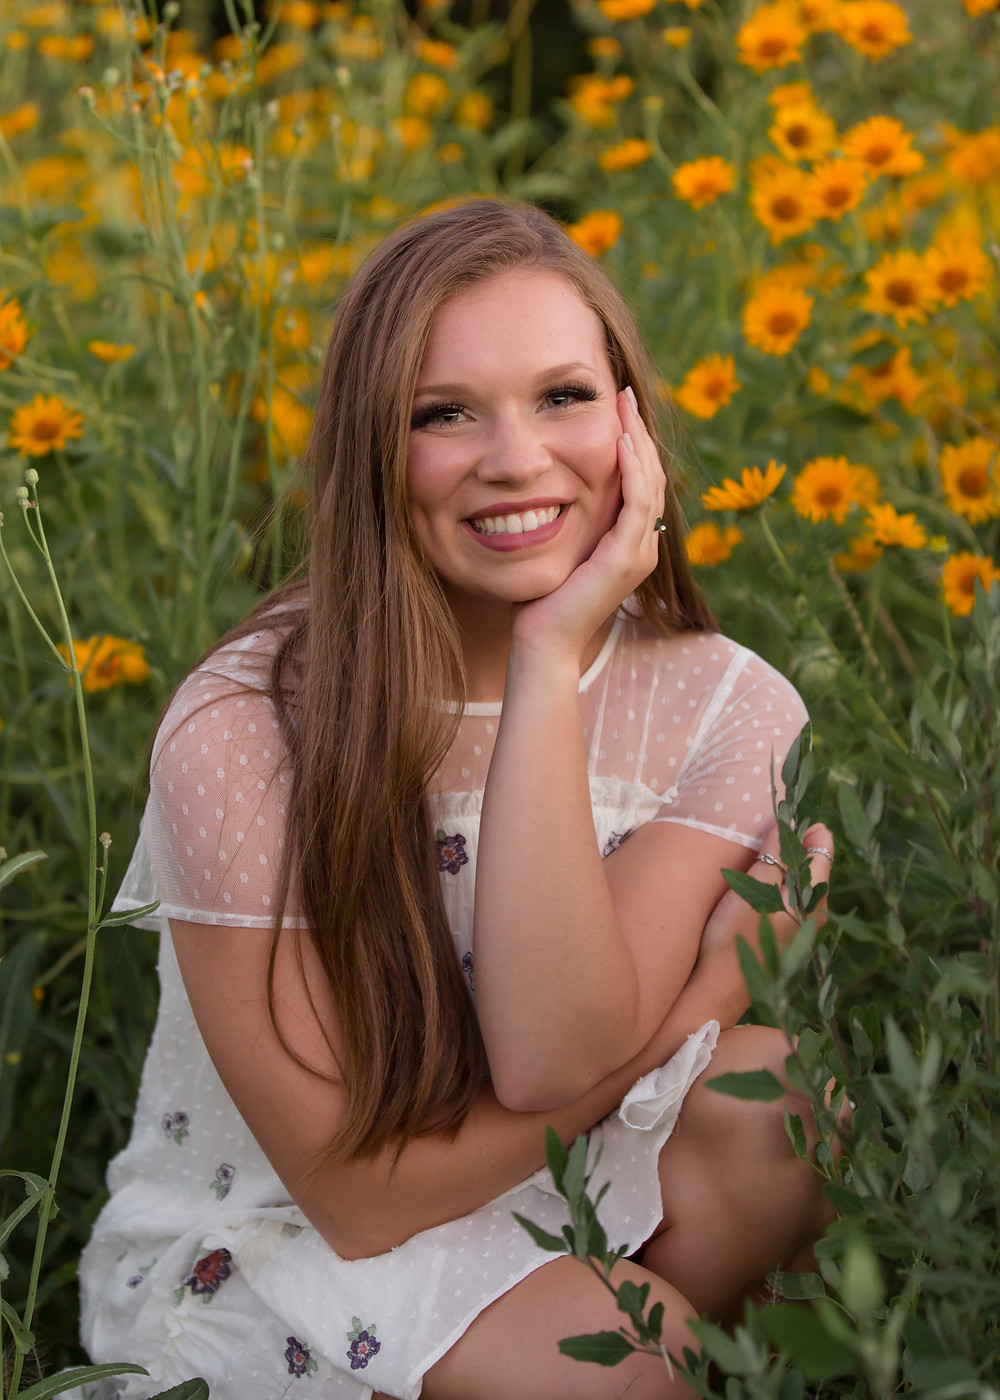 West Fargo Senior Portrait Photographer